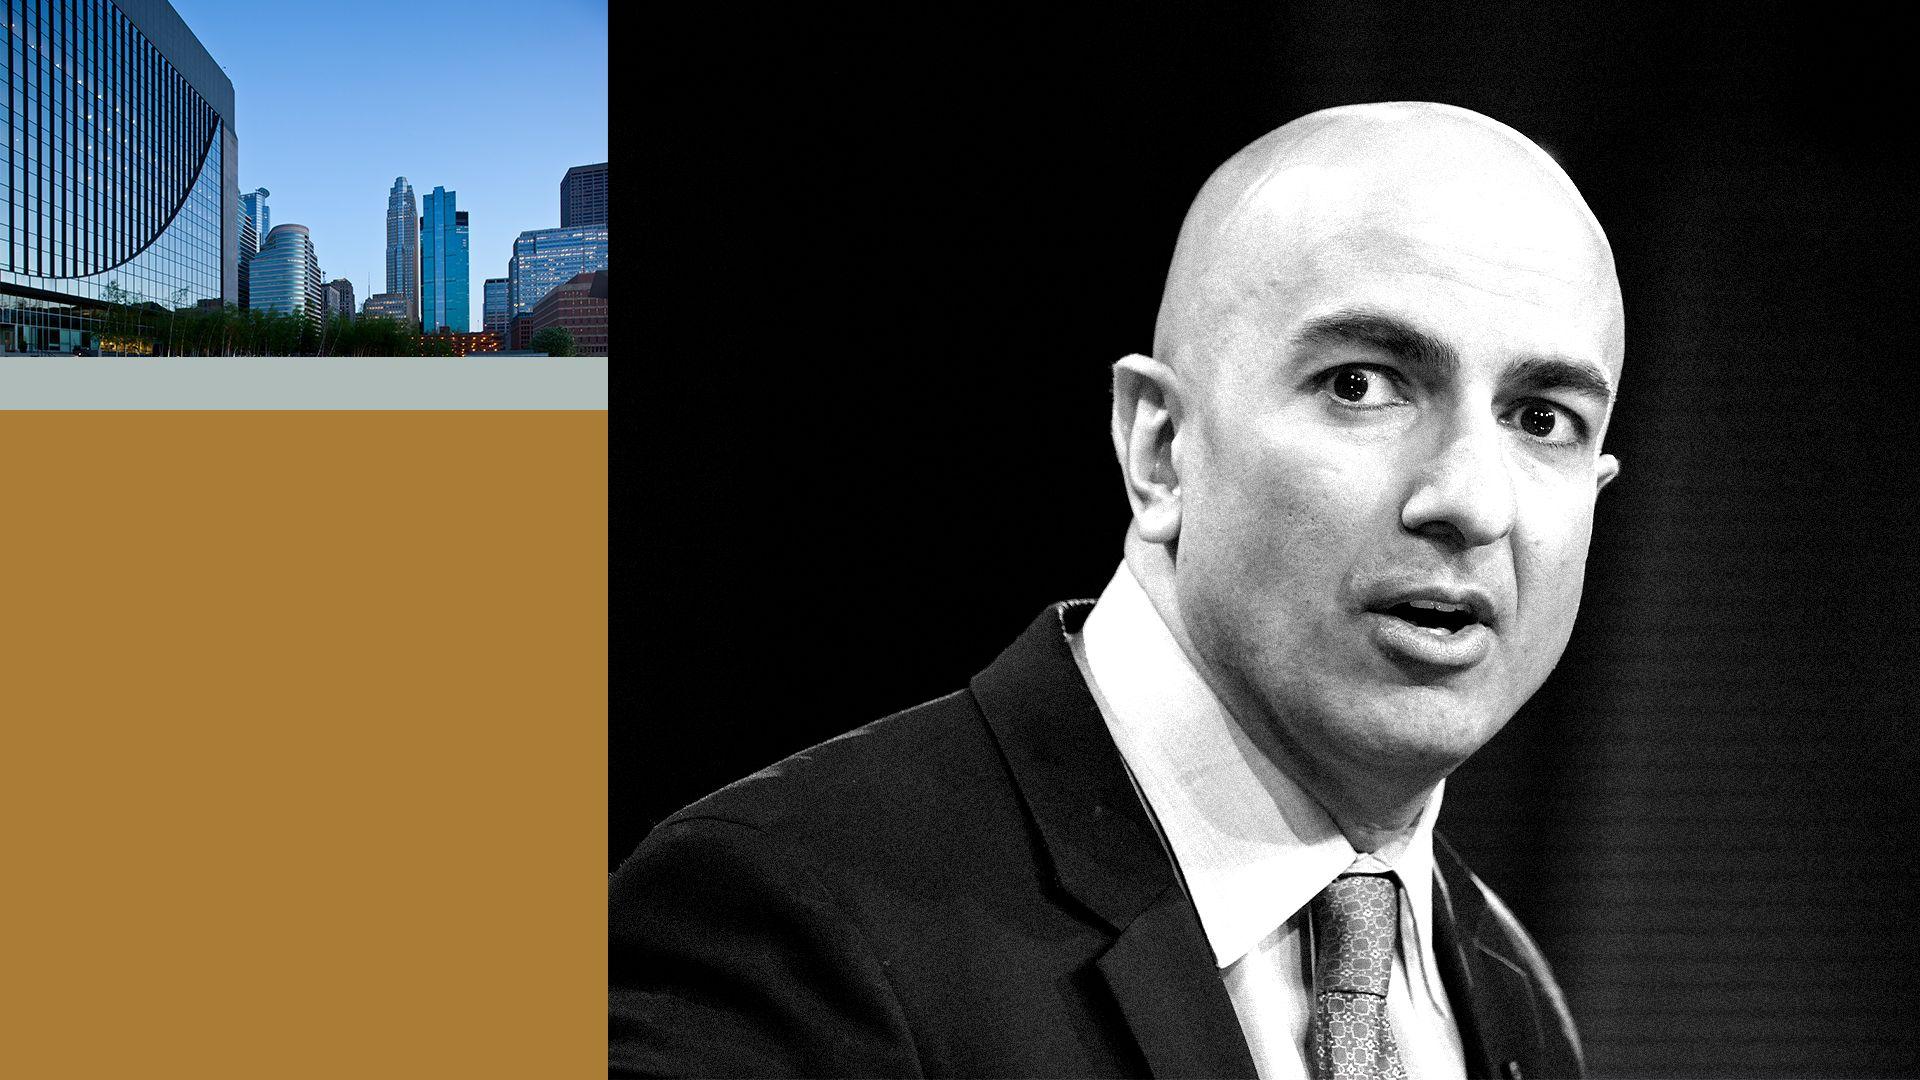 Collage of Minneapolis Fed president Neel Kashari and city imagery